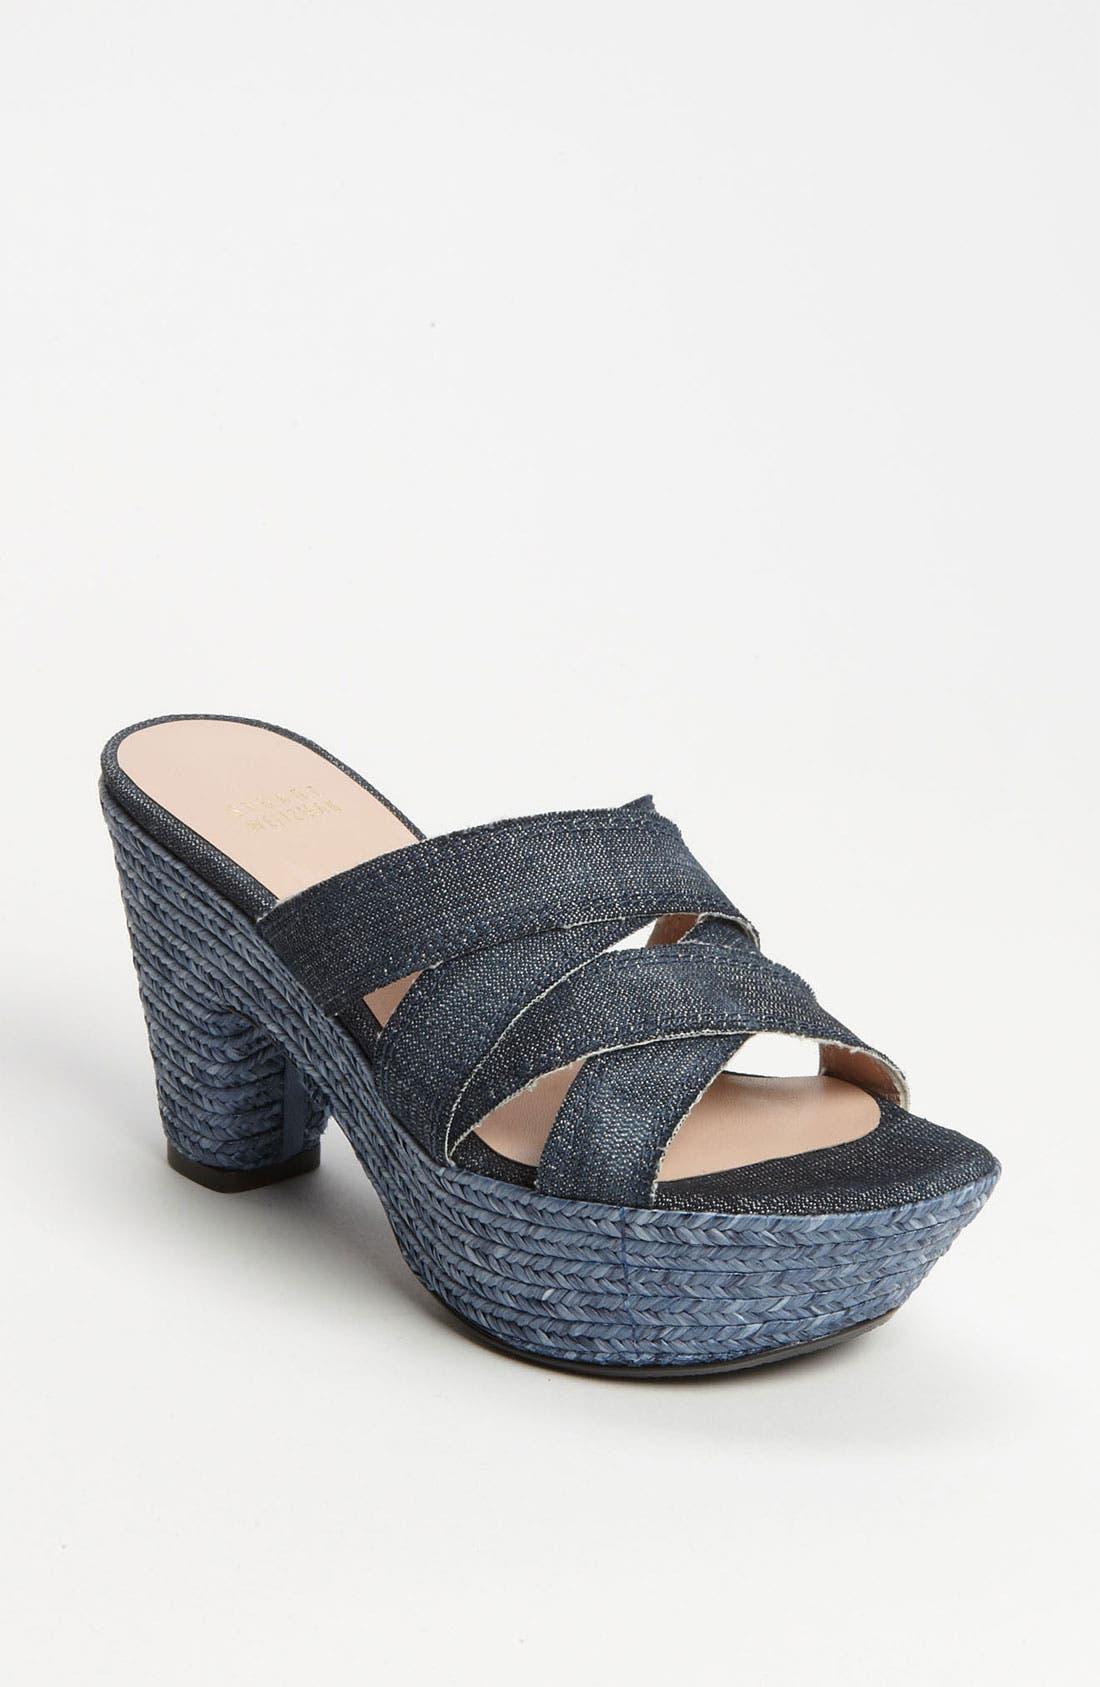 Alternate Image 1 Selected - Stuart Weitzman 'Sliderules' Sandal